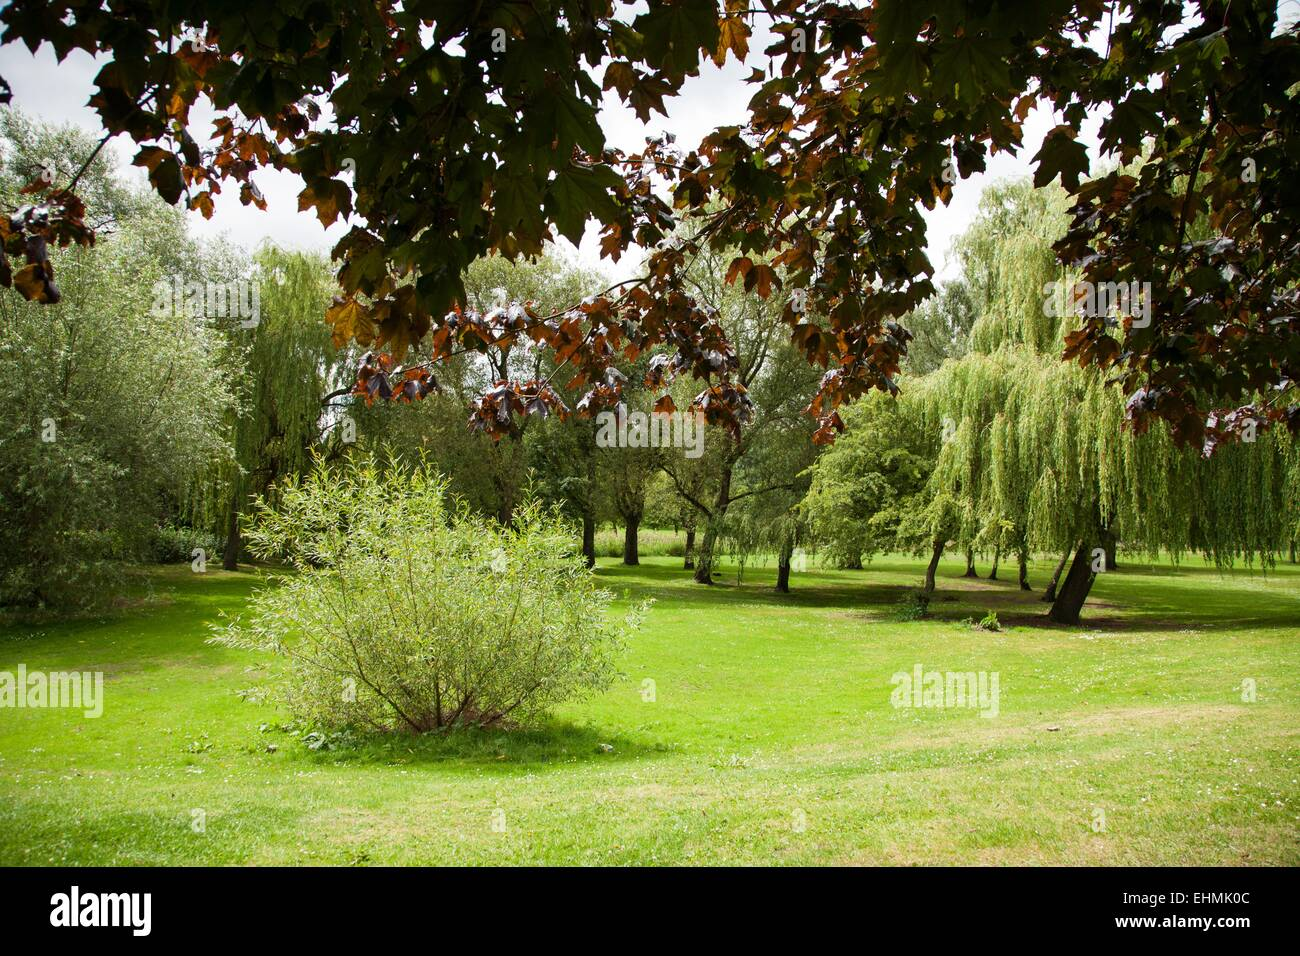 Cole End Park Nature Reserve, Coleshill, West Midlands - Stock Image